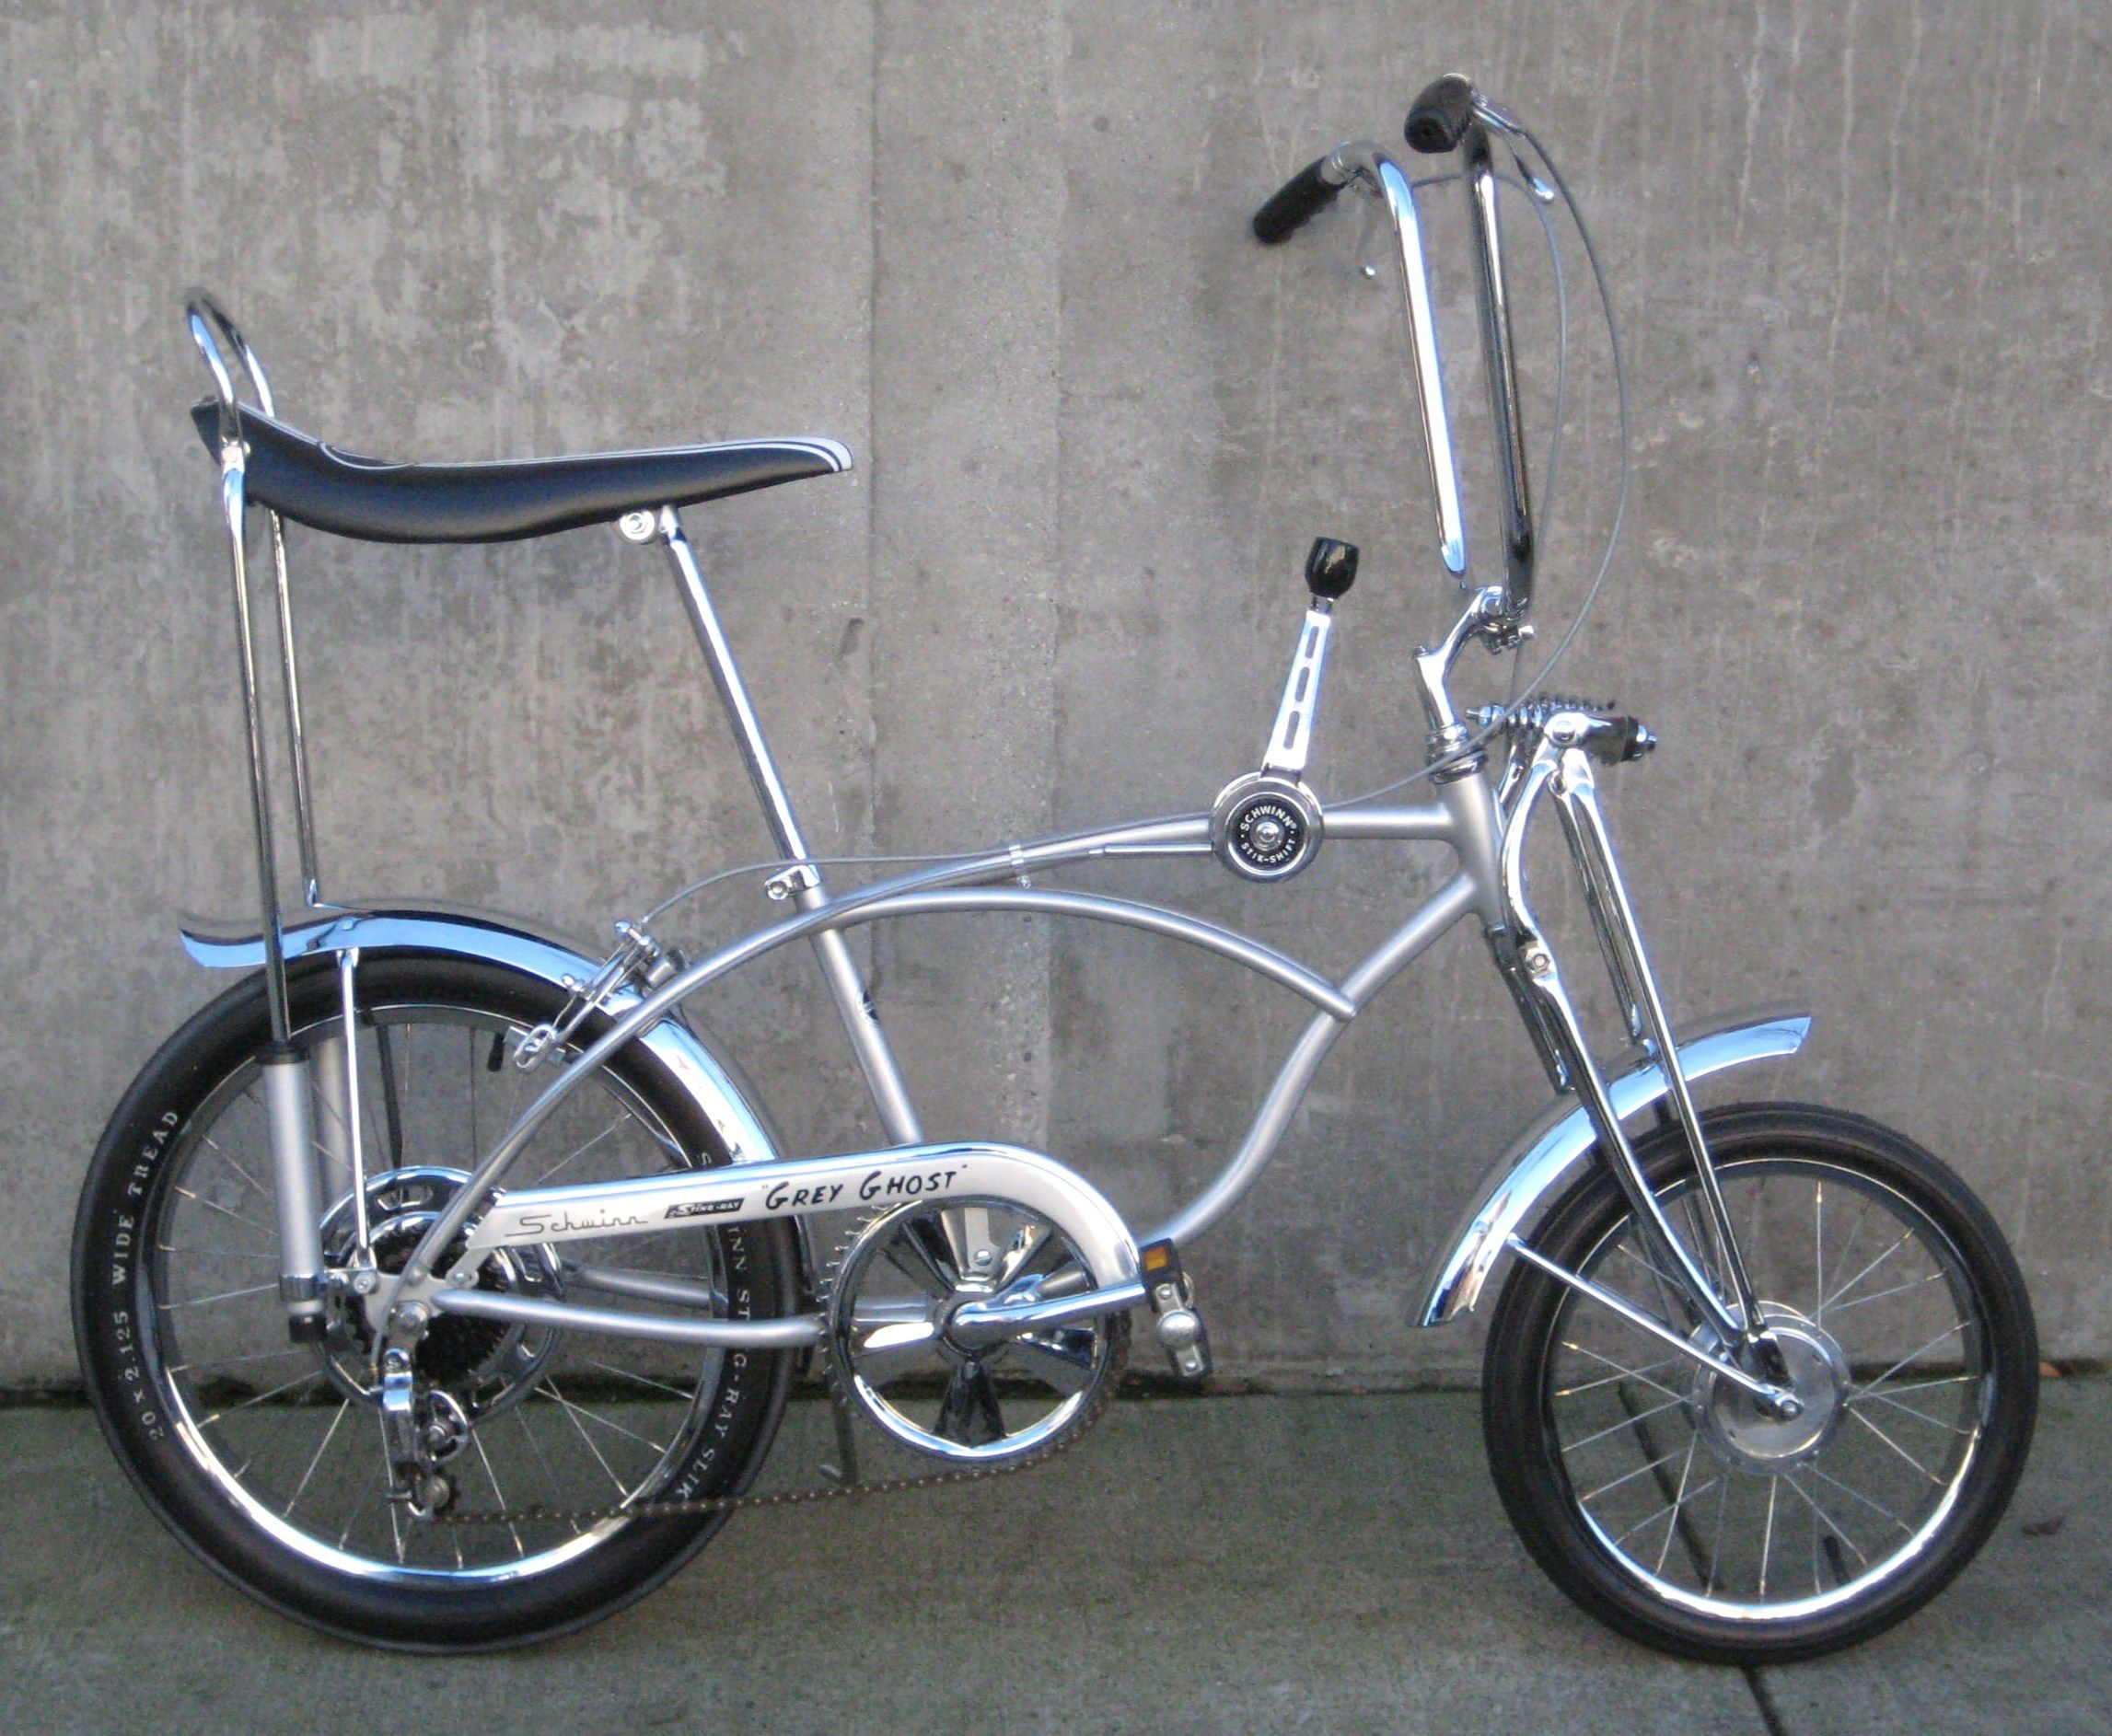 Museum Bikes From 1966 To 1985 On Display At Classic Cycle Classic Cycle Bainbridge Island Kitsap County Schwinn Bicycles Schwinn Bike Lowrider Bicycle